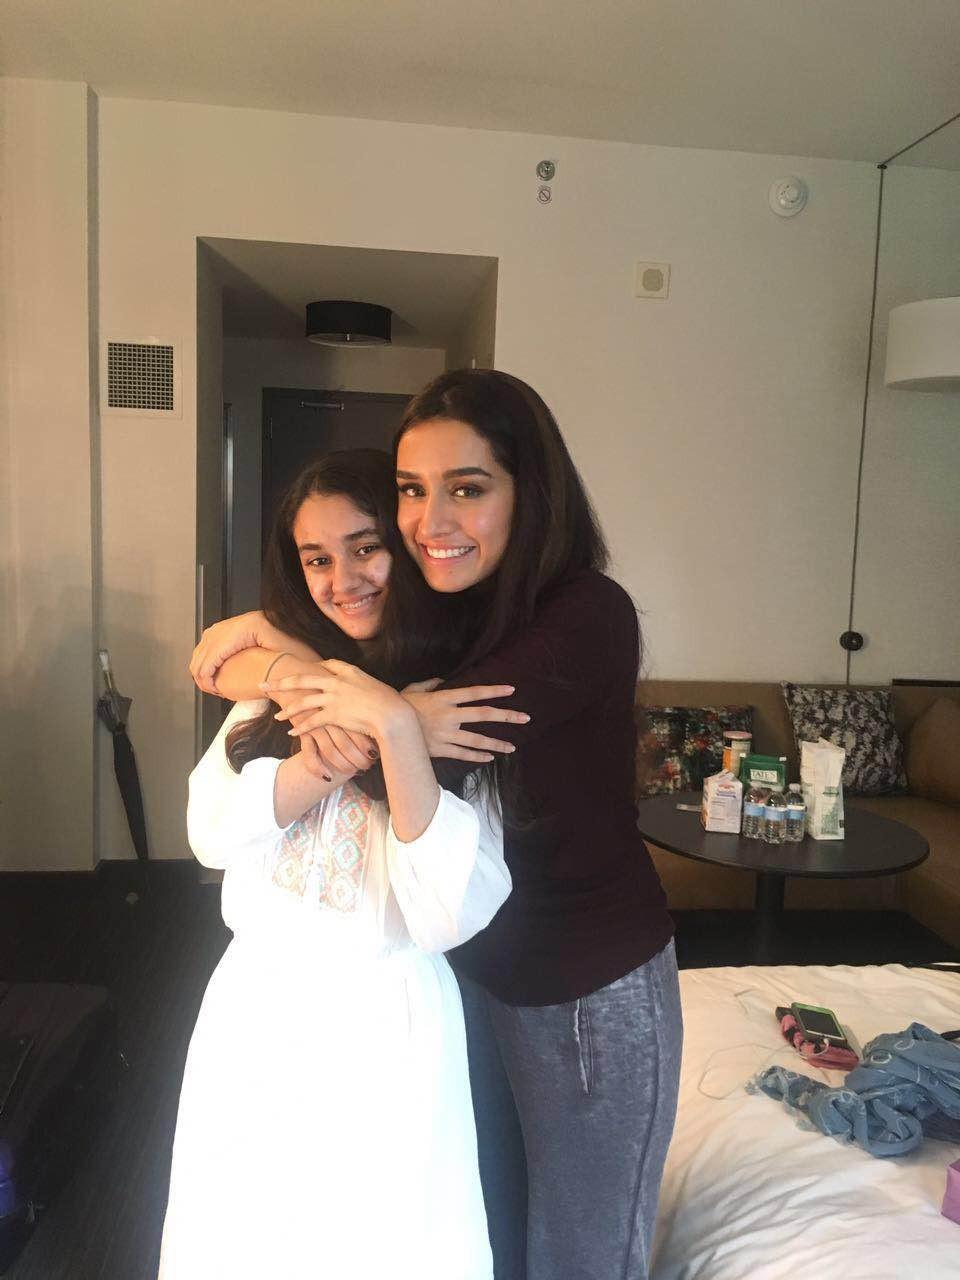 Shraddha Kapoor,Shraddha Kapoor with her fan,Shraddha Kapoor fan,Shraddha with her fan,Half Girlfriend,half girlfriend cast,shahid half girlfriend,Samina